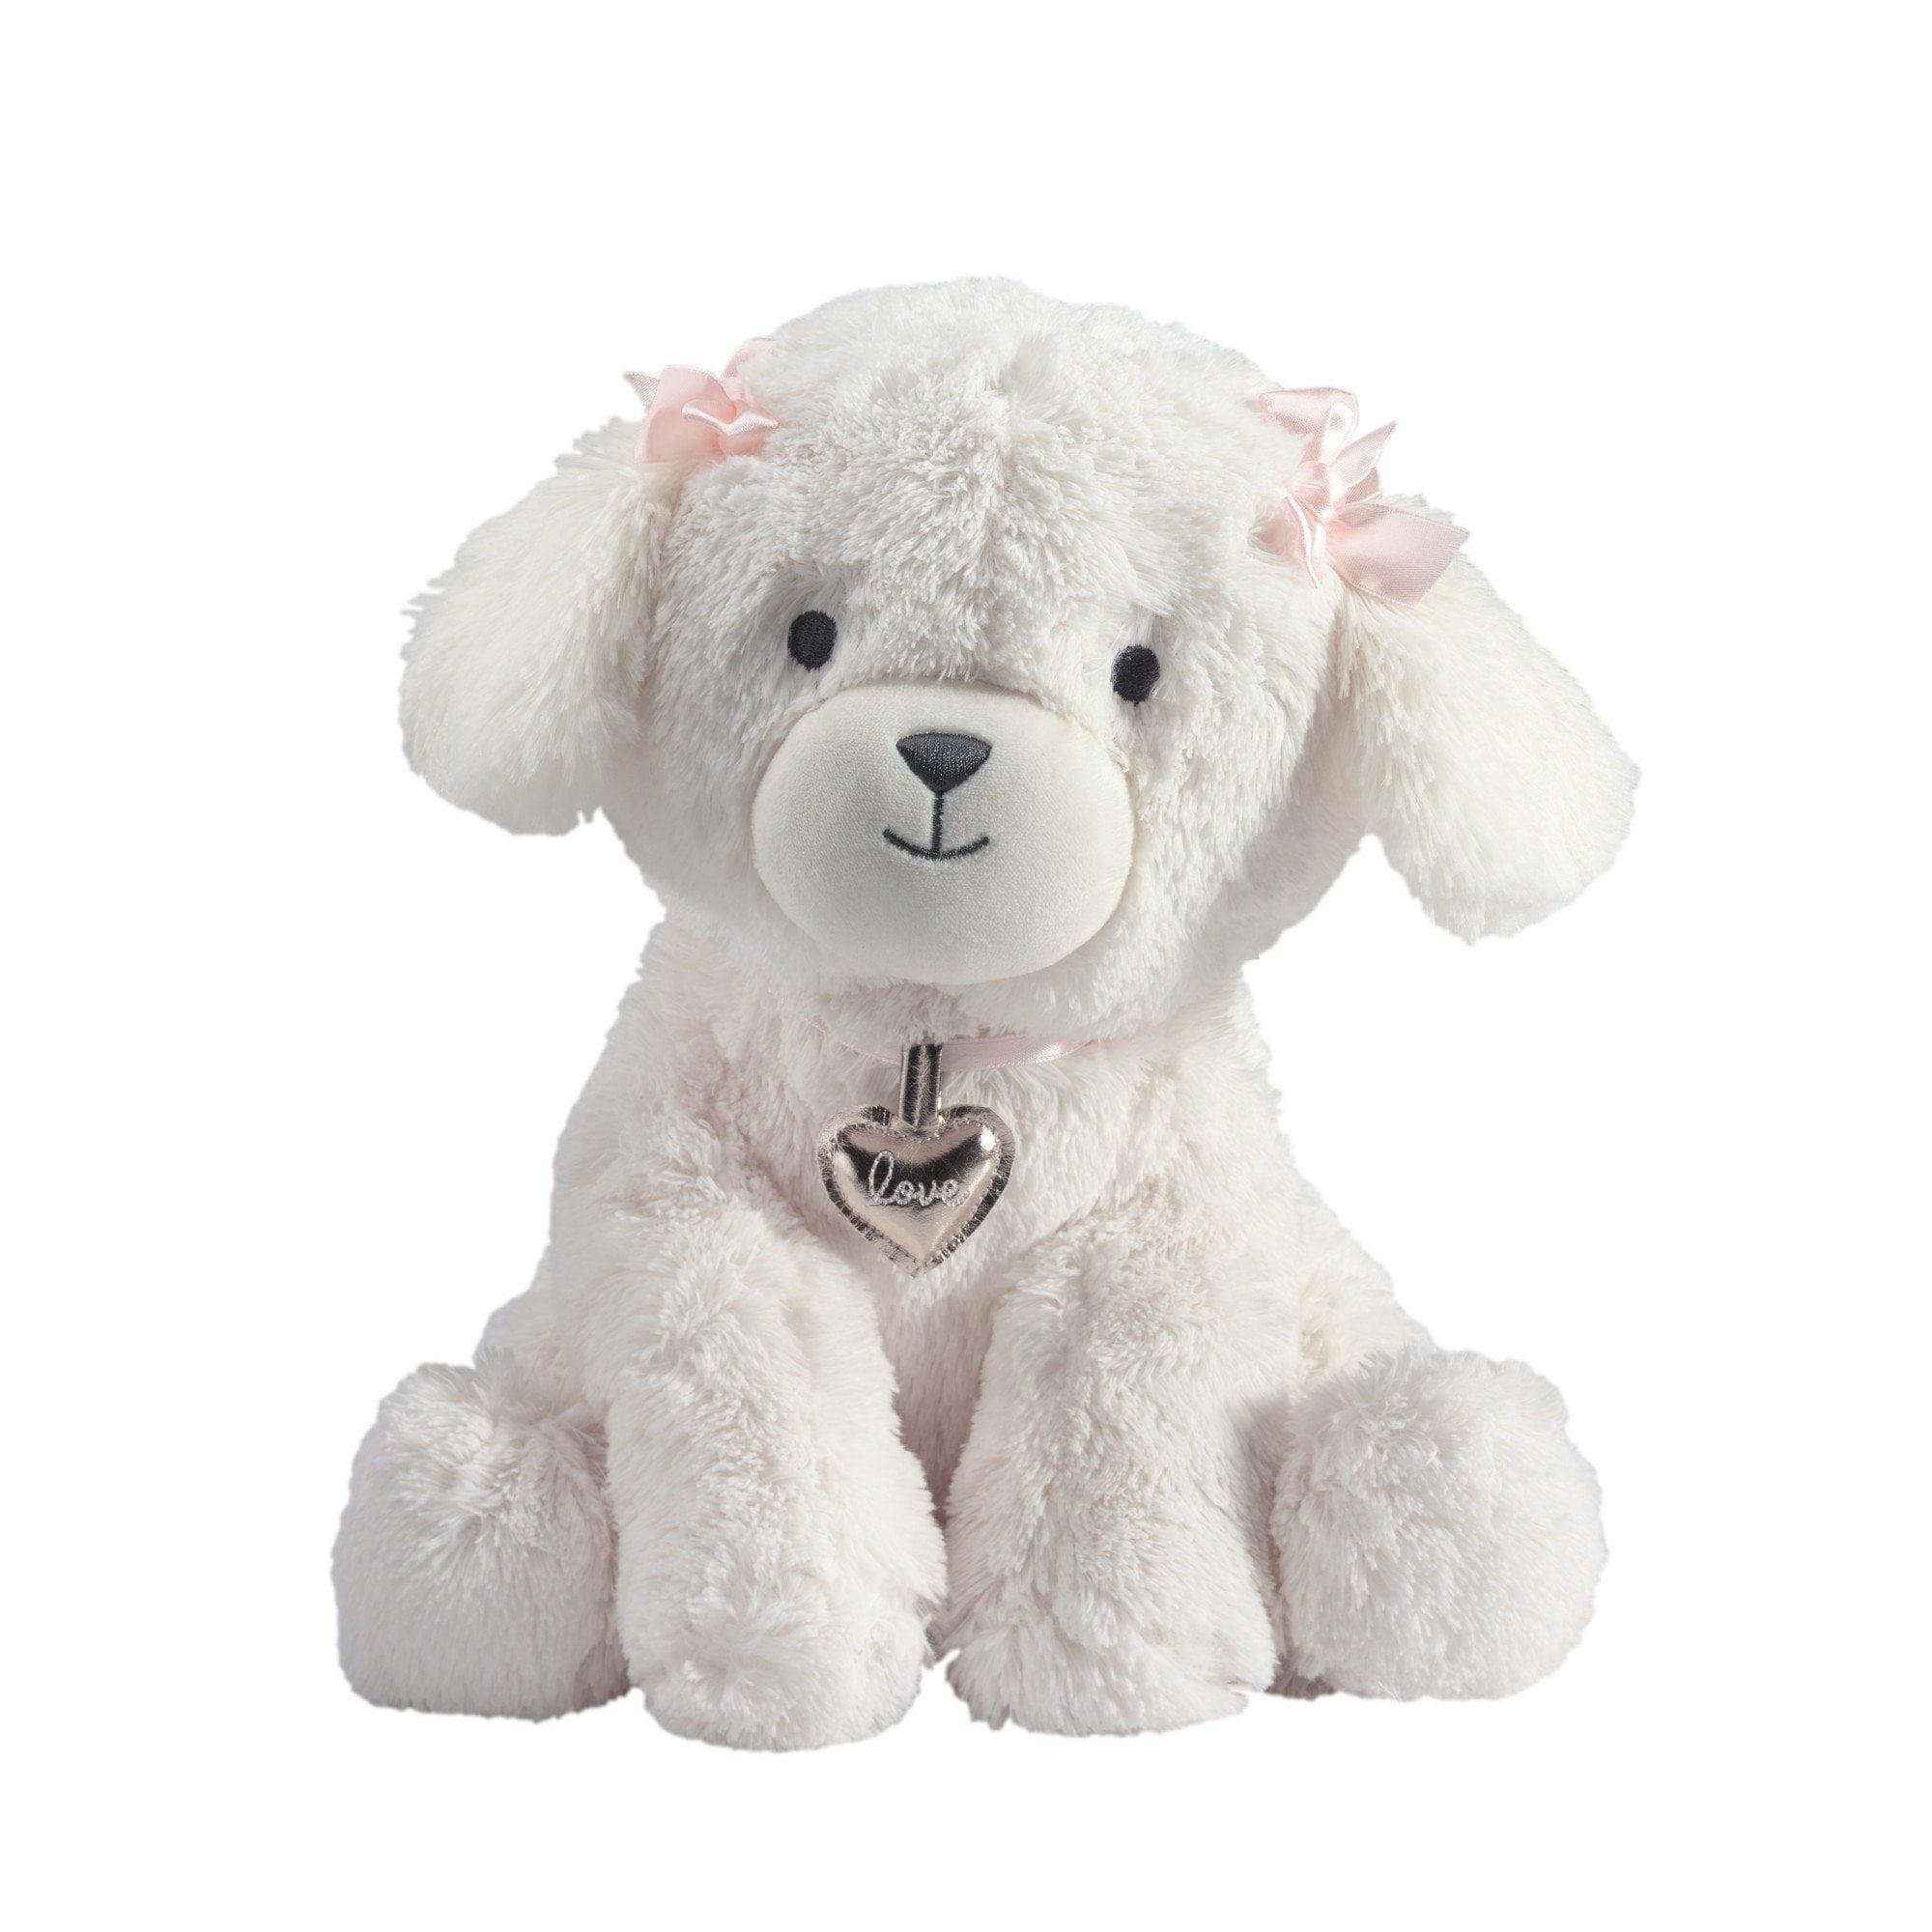 Lambs Ivy Baby Love White Plush Puppy Stuffed Animal Dog Annie